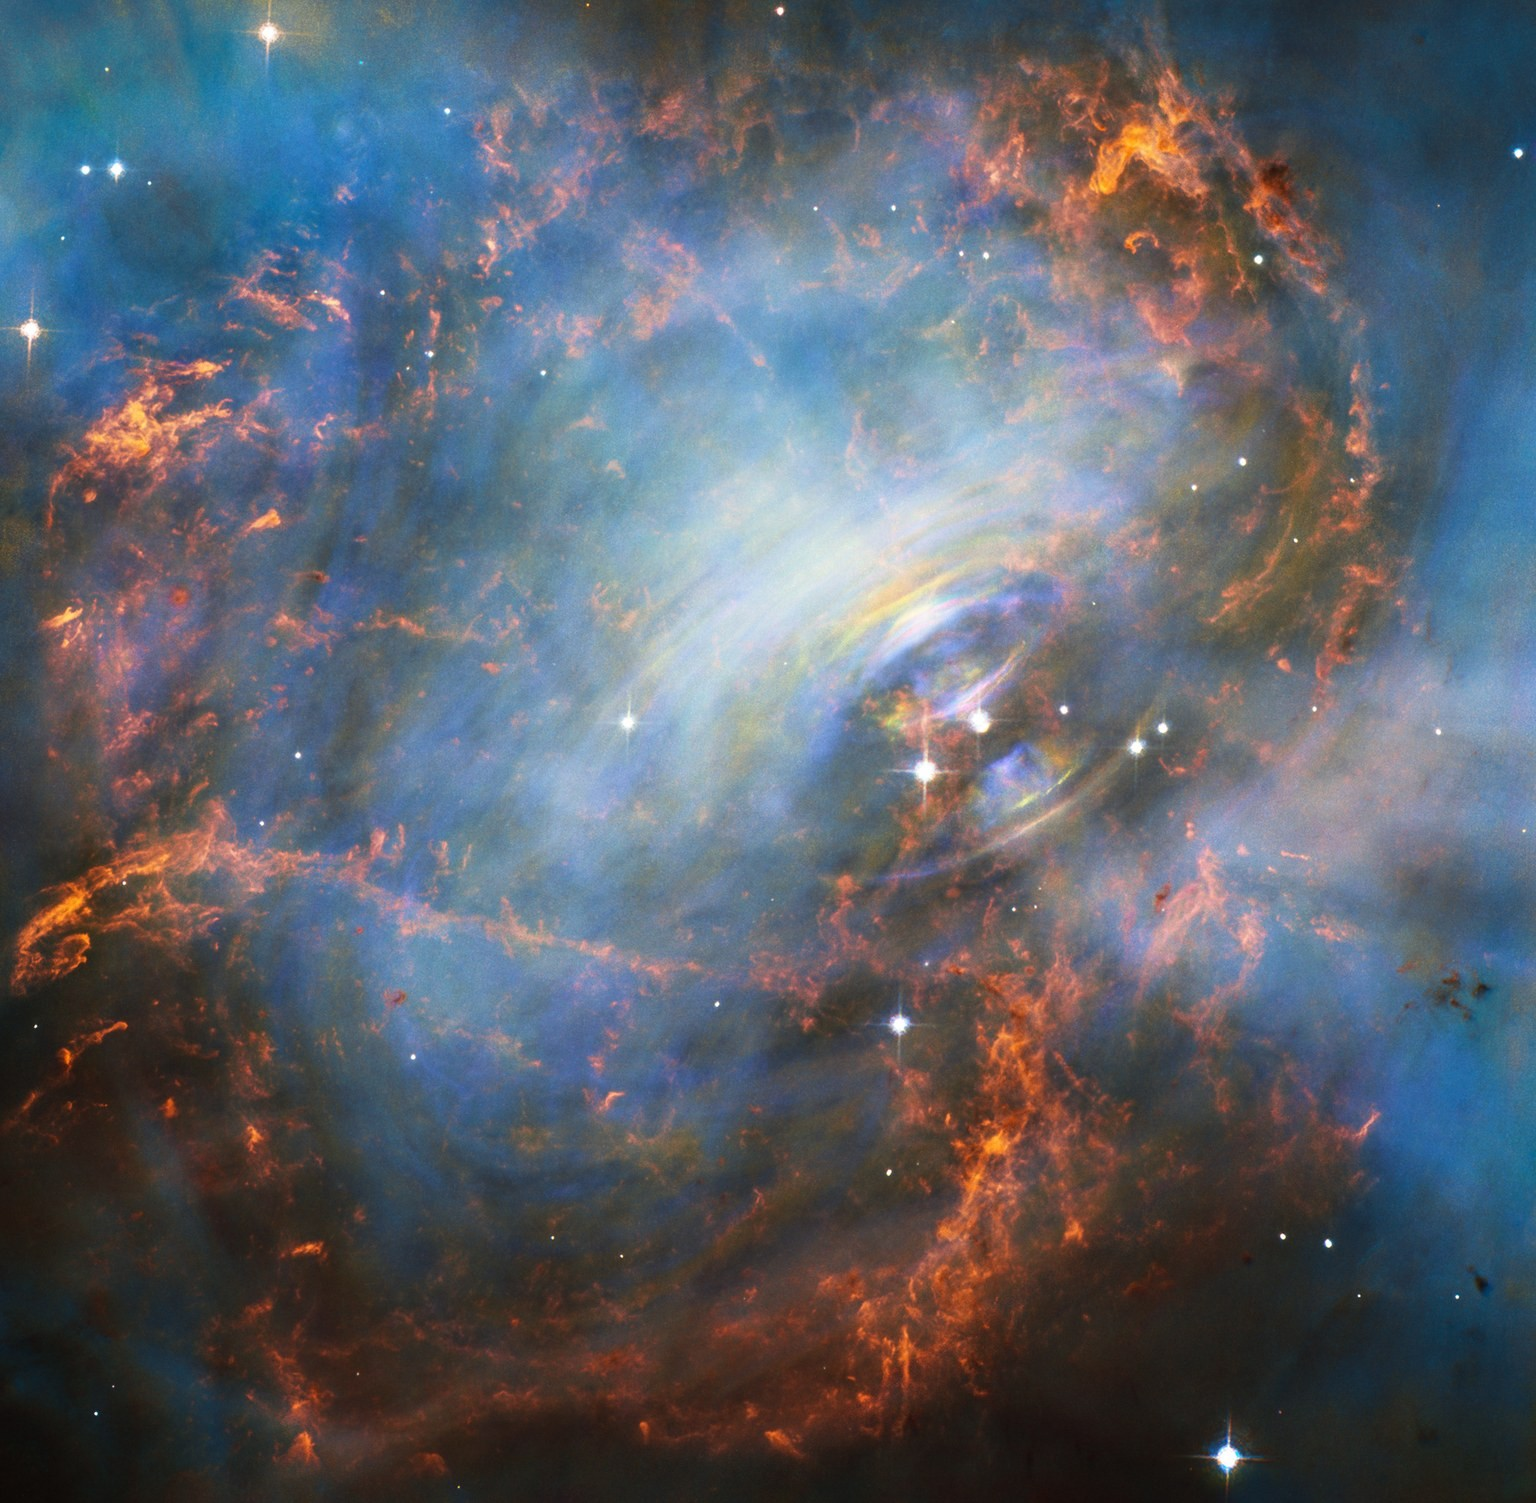 General 1536x1503 space galaxy Crab Nebula